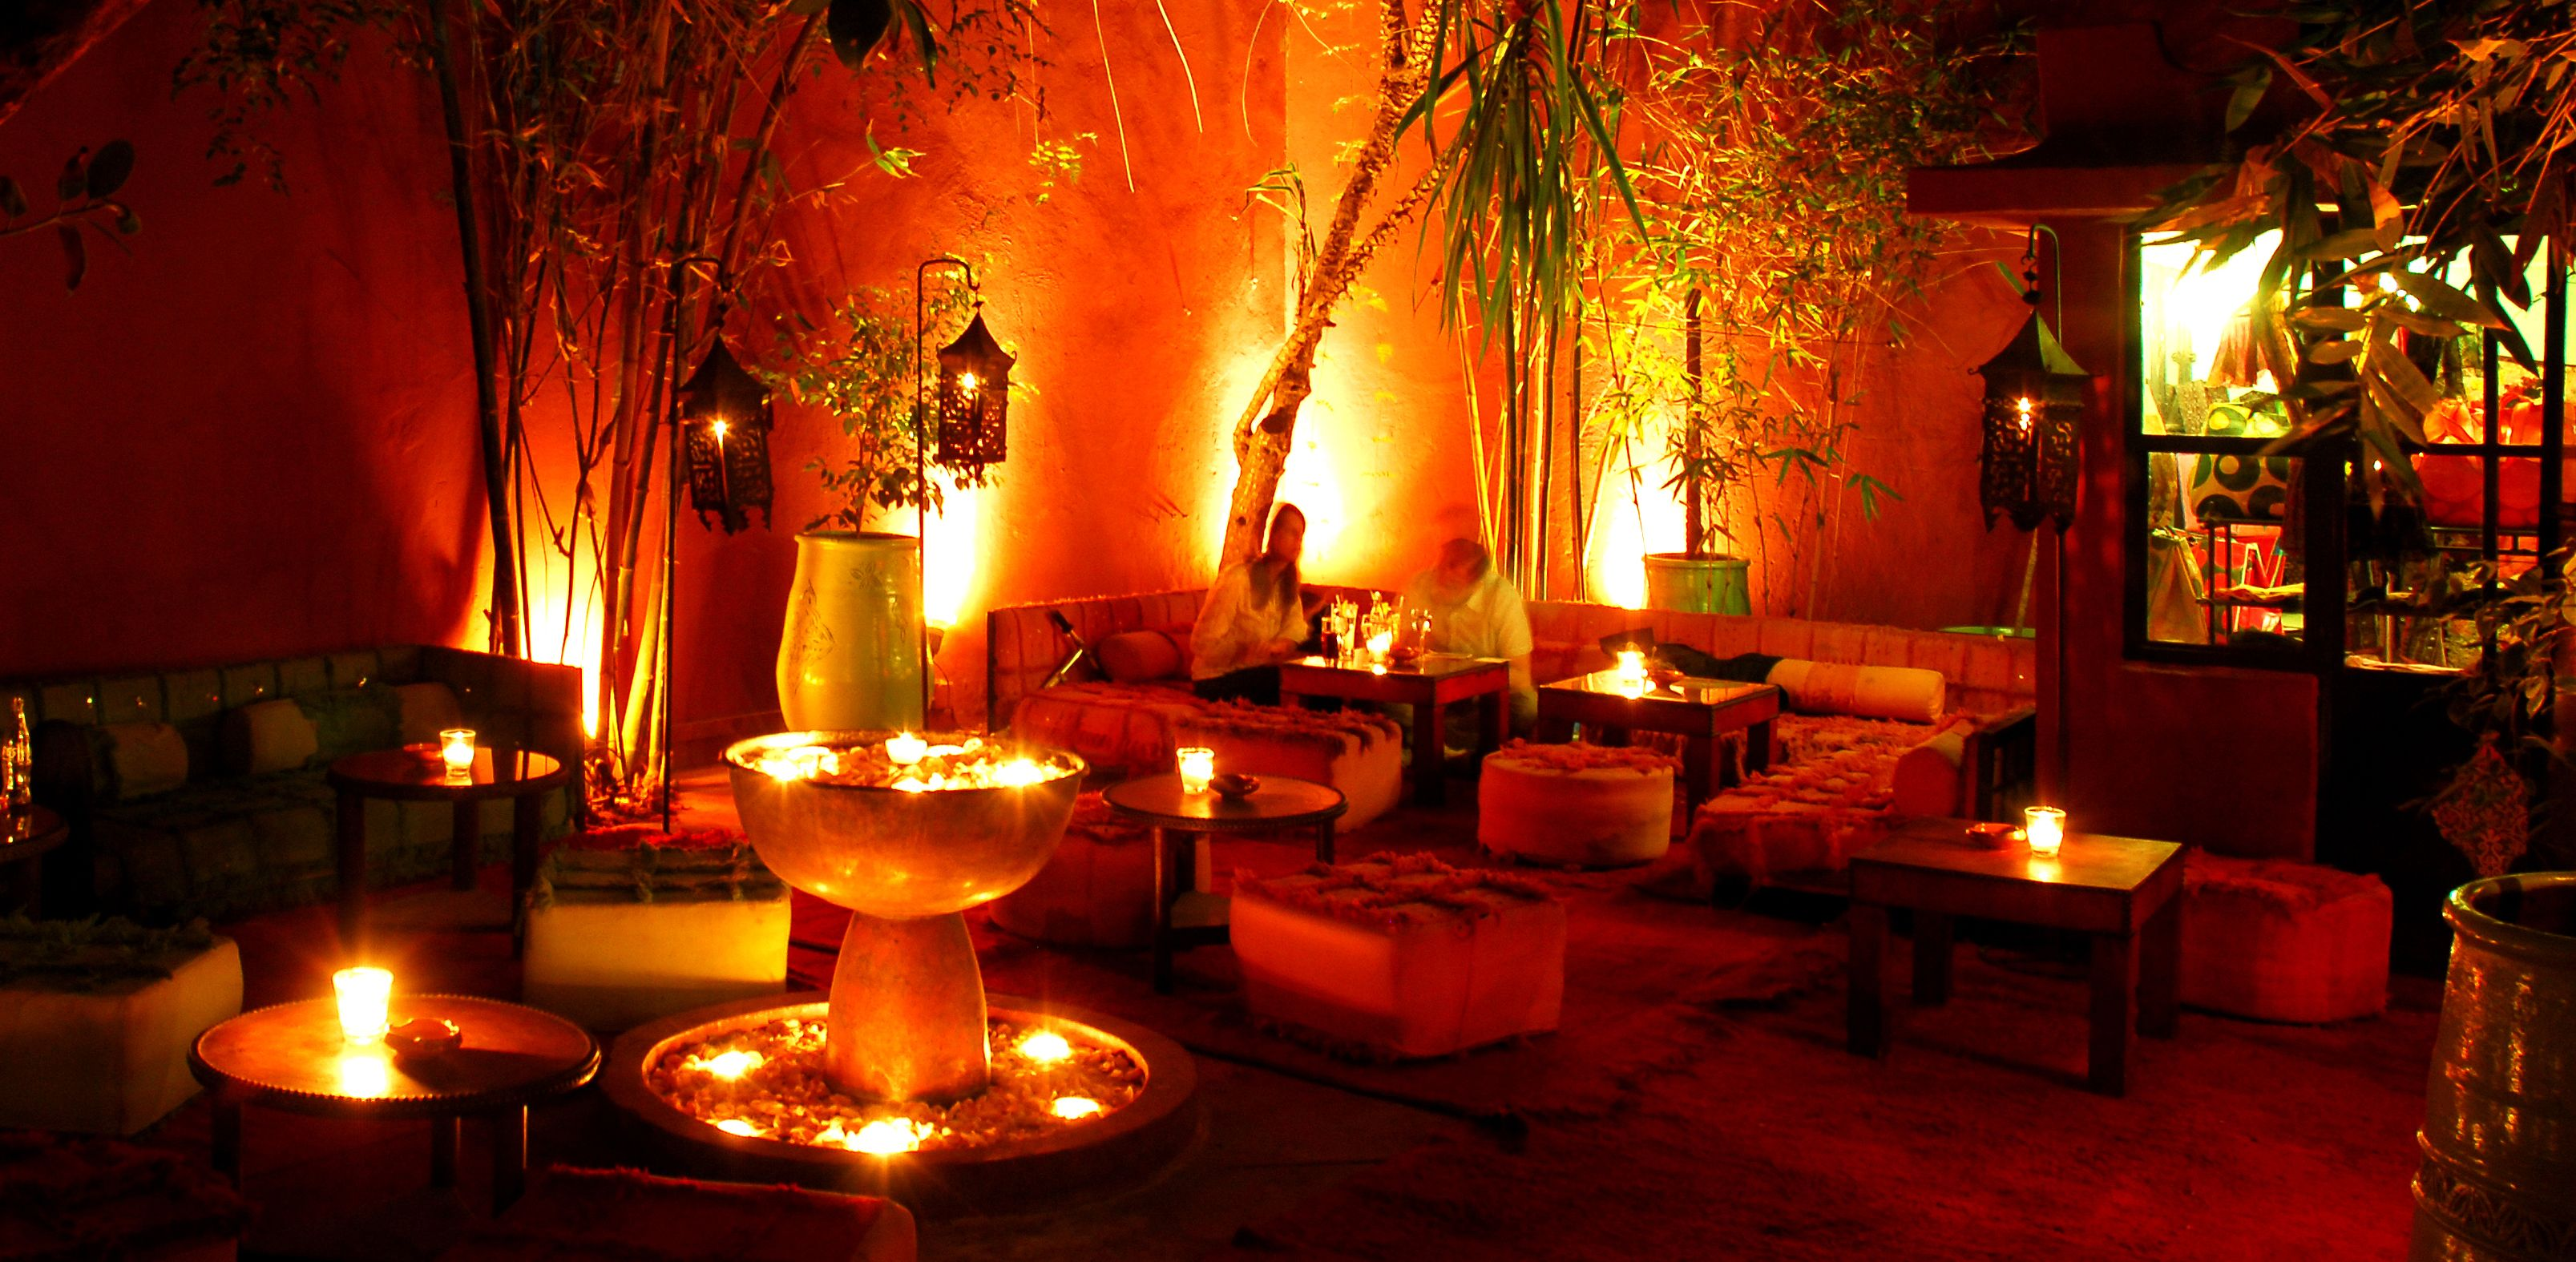 bars in marrakech le comptoir darna. Black Bedroom Furniture Sets. Home Design Ideas